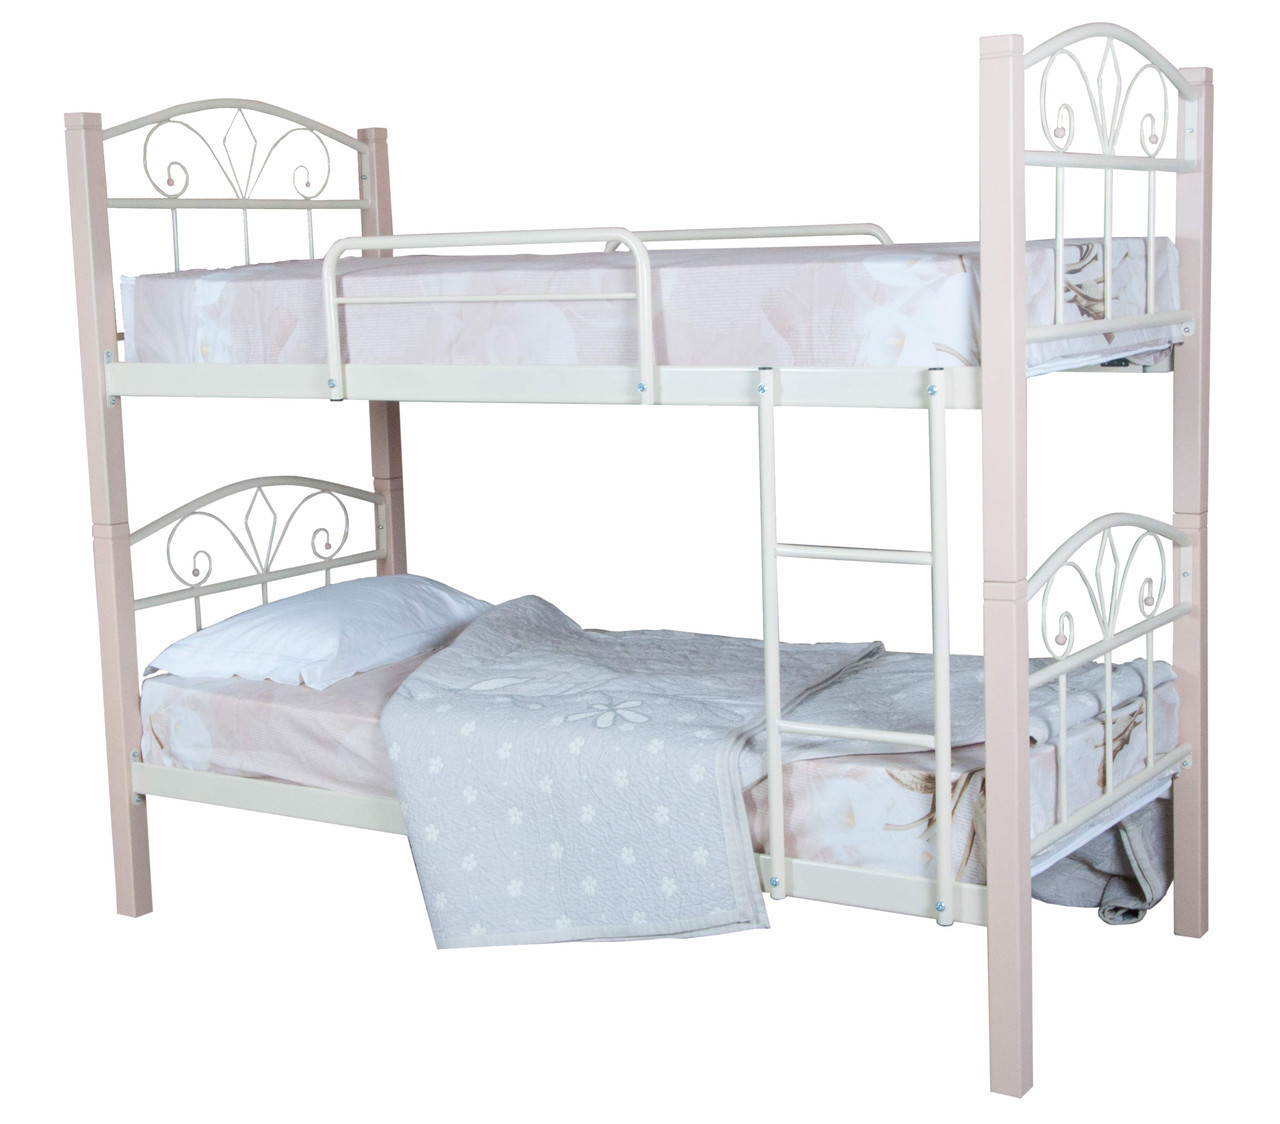 Кровать Лара Люкс Вуд двухъярусная  200х90, бирюзовая